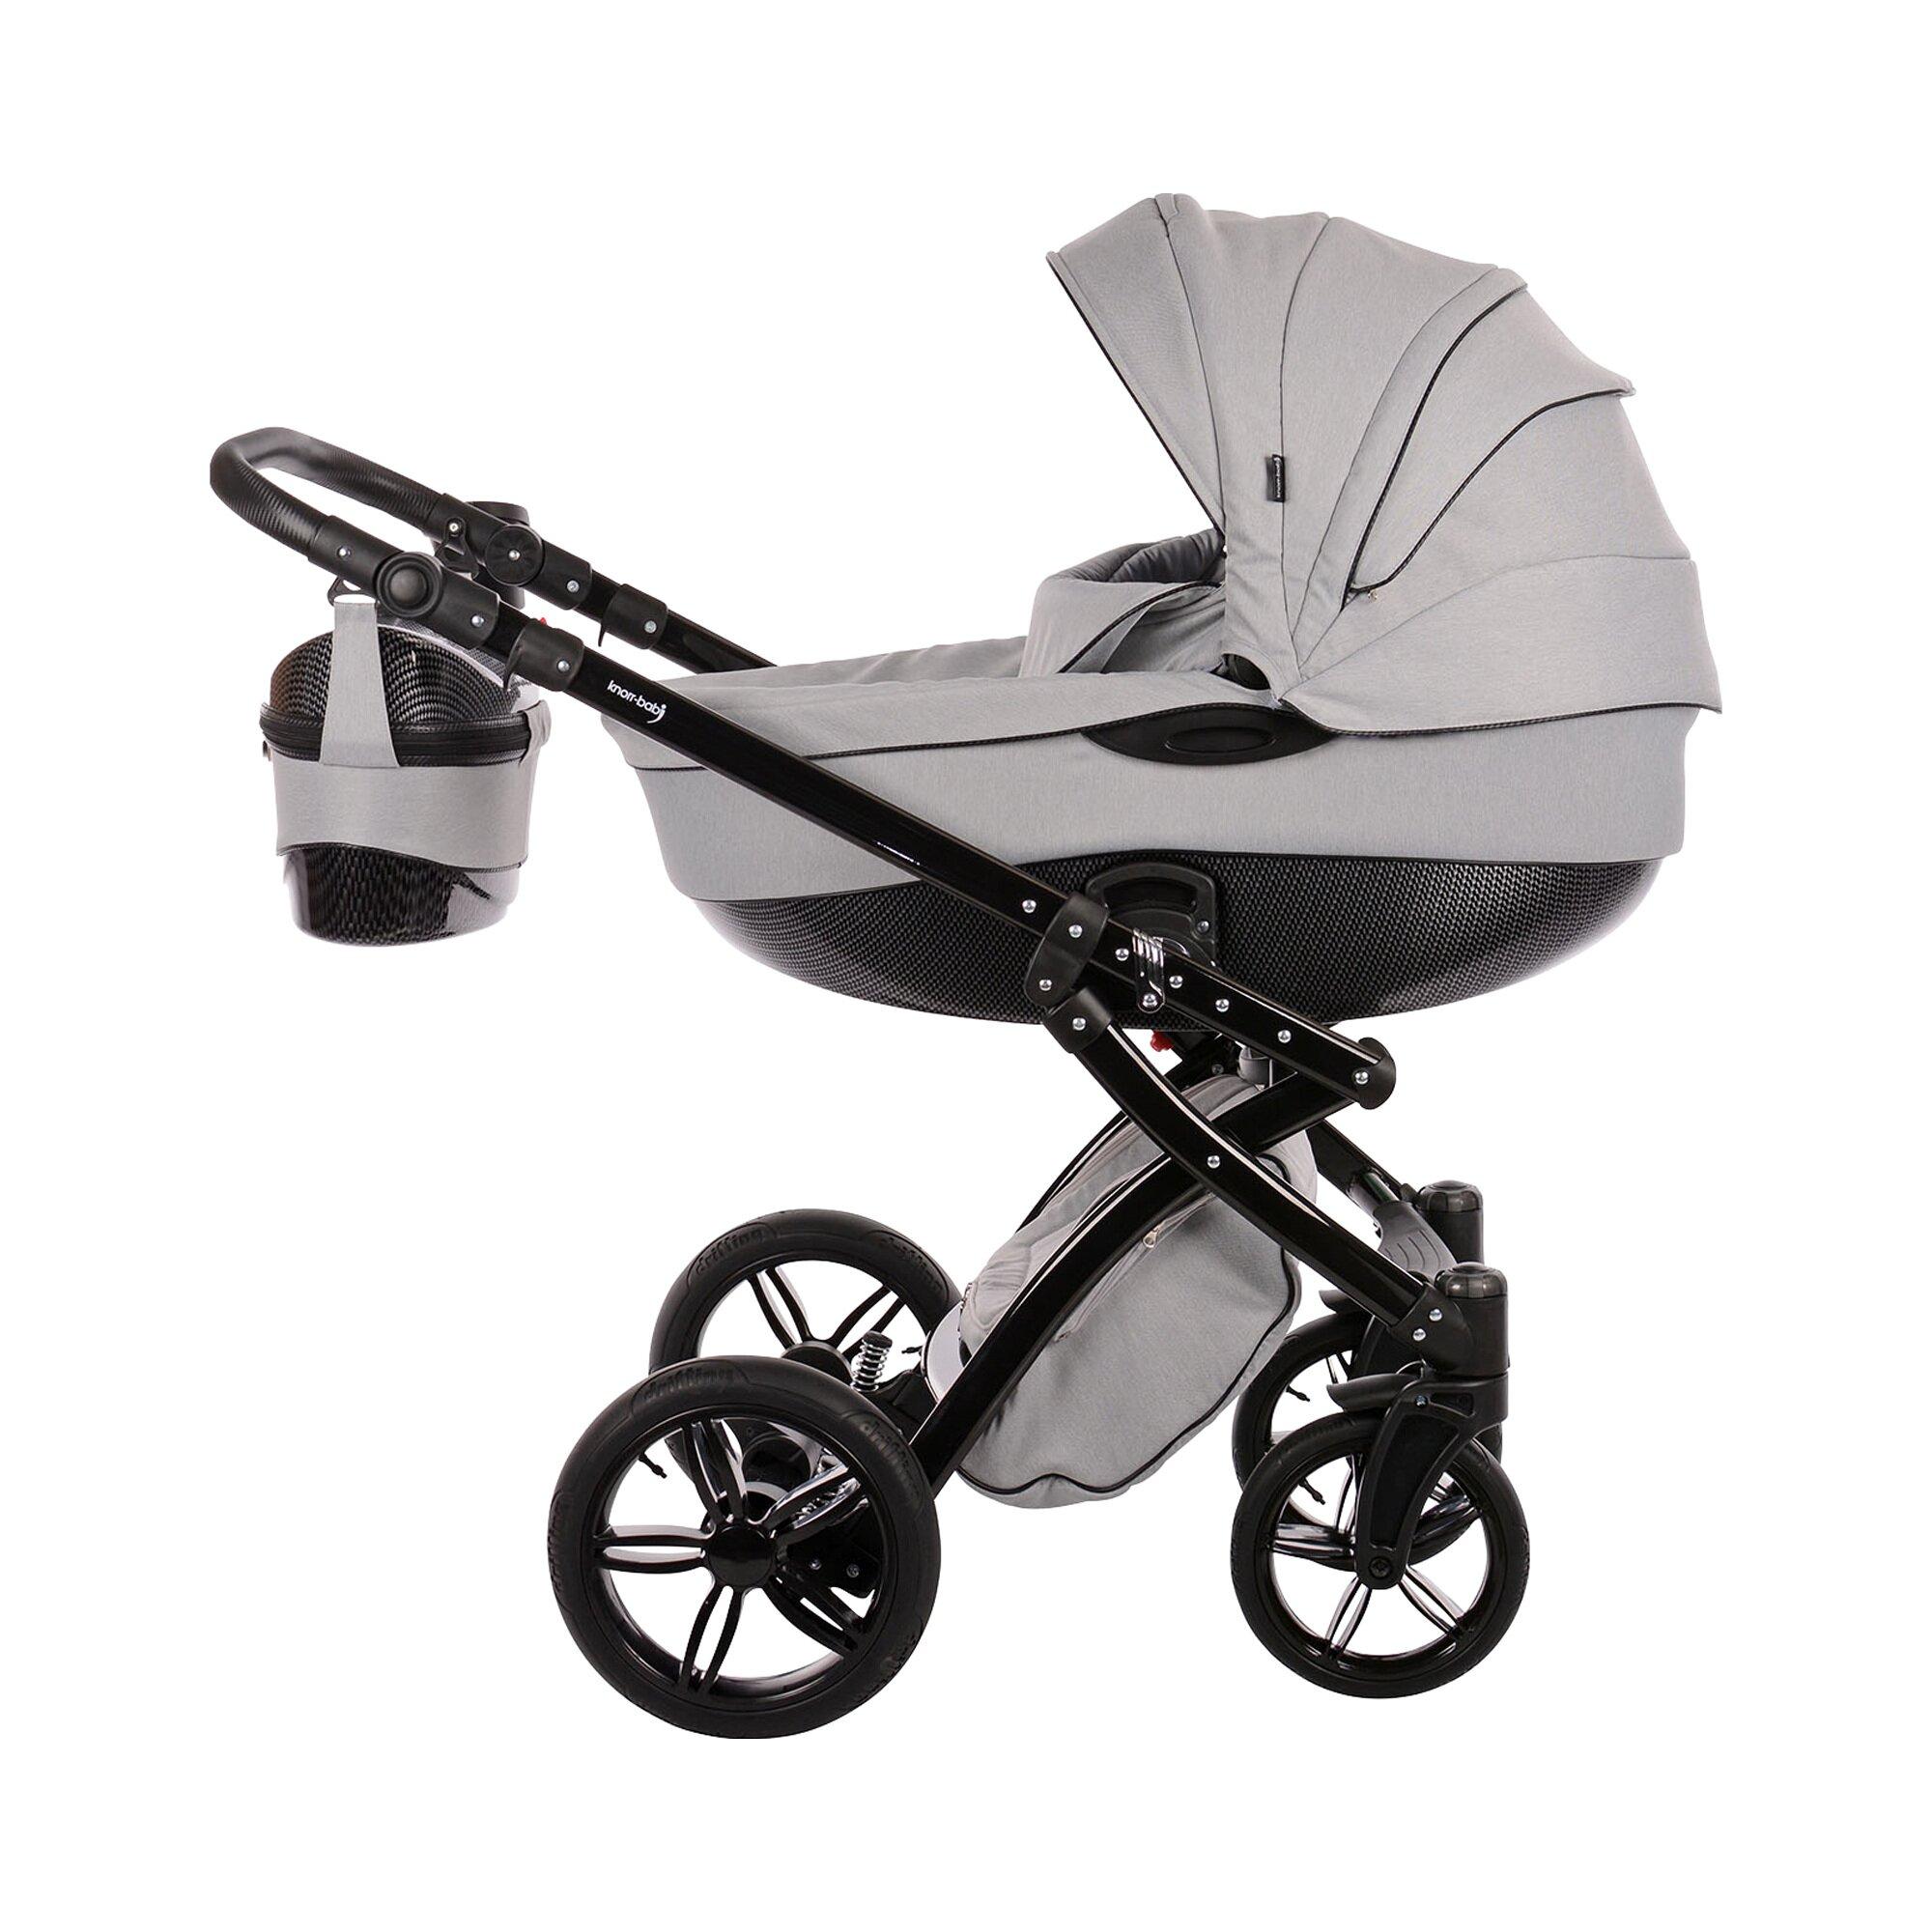 knorr-baby-alive-be-carbon-kombikinderwagen-design-2017-grau